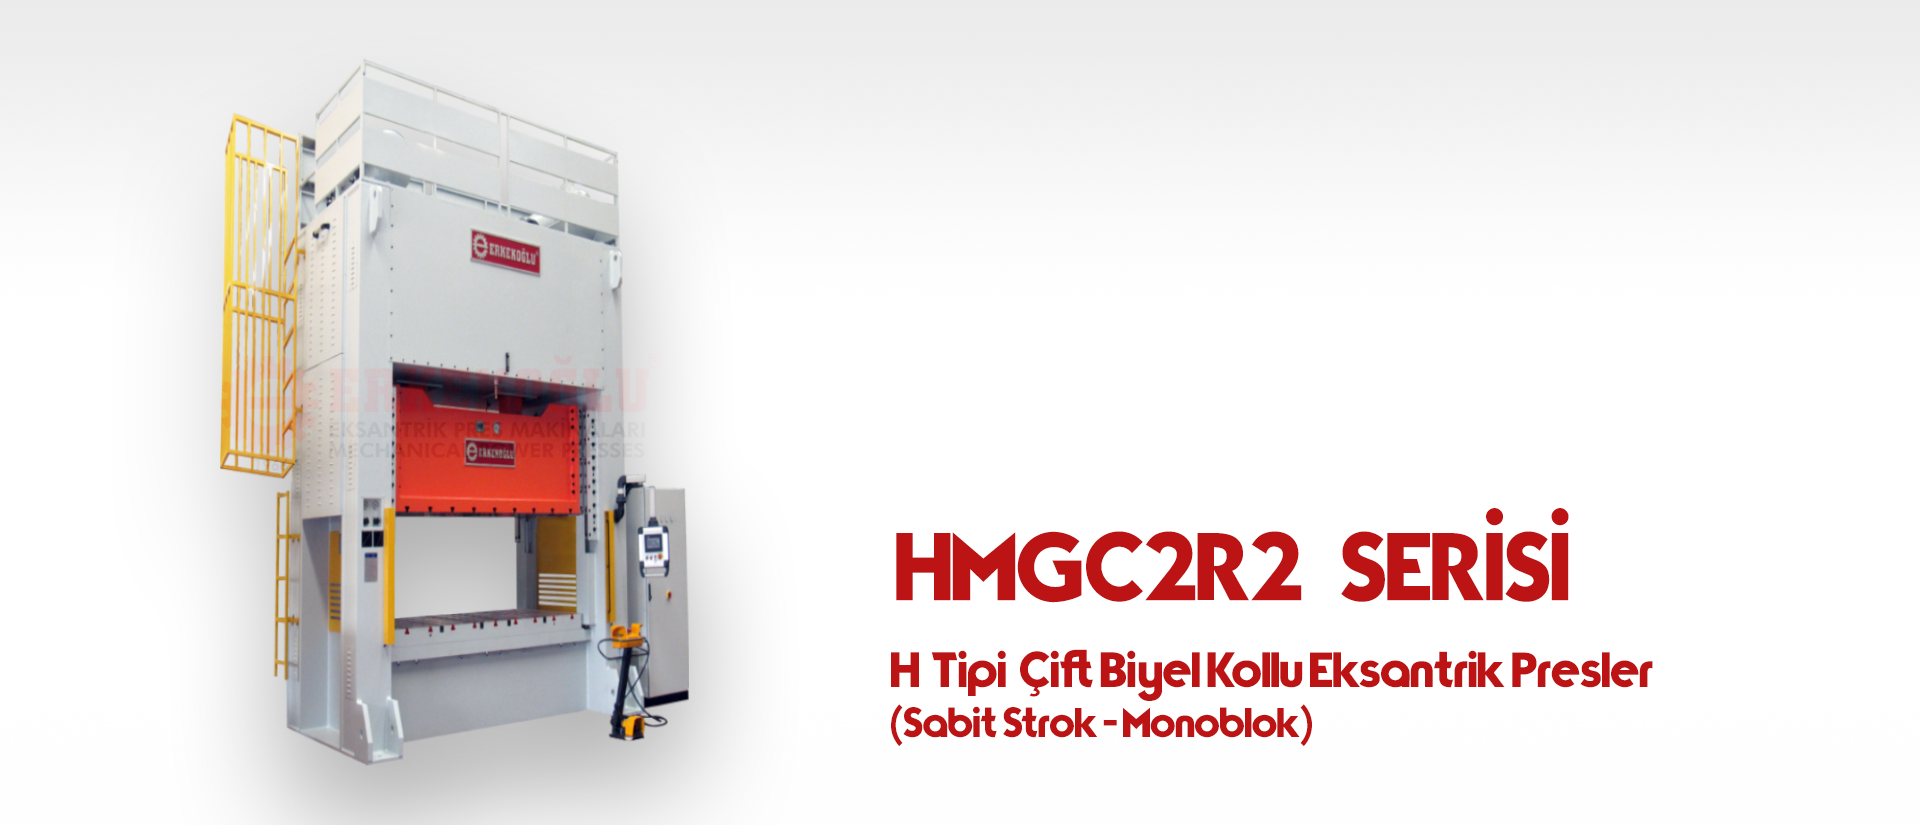 hmgc2r2-baslik-tr